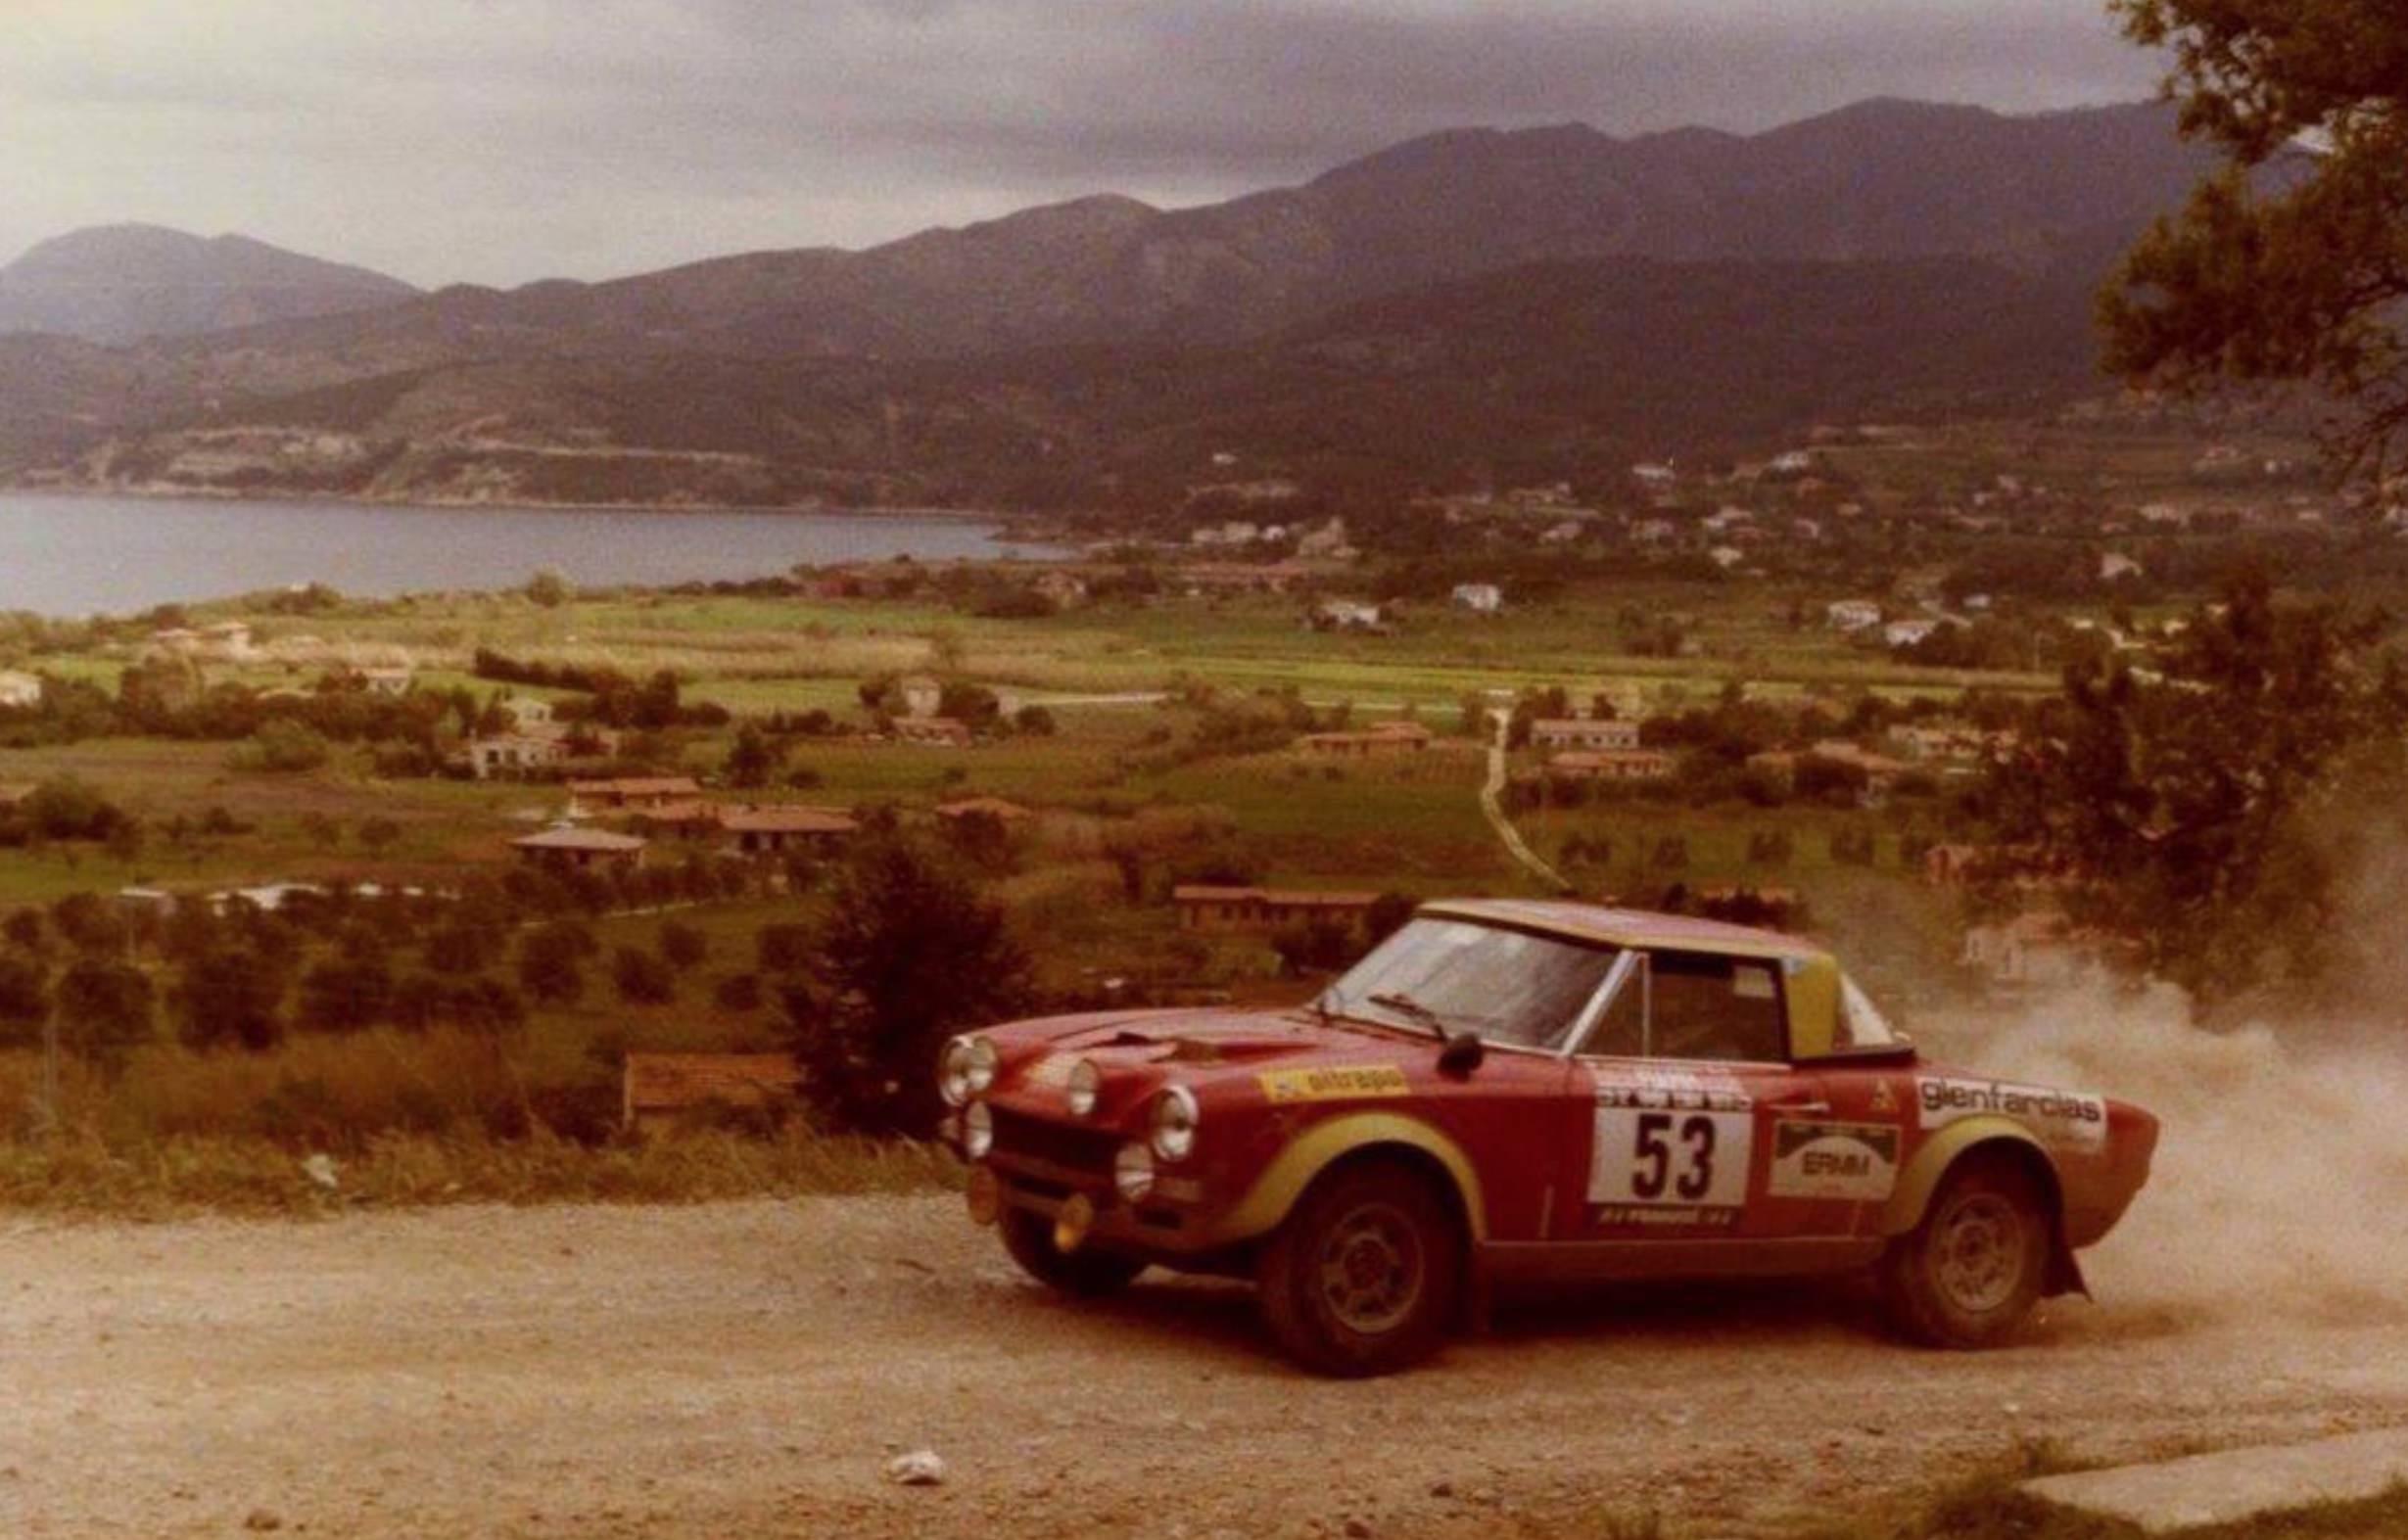 Ex Works 1975 Fiat Abarth 124 Rallye Group 4 Spider